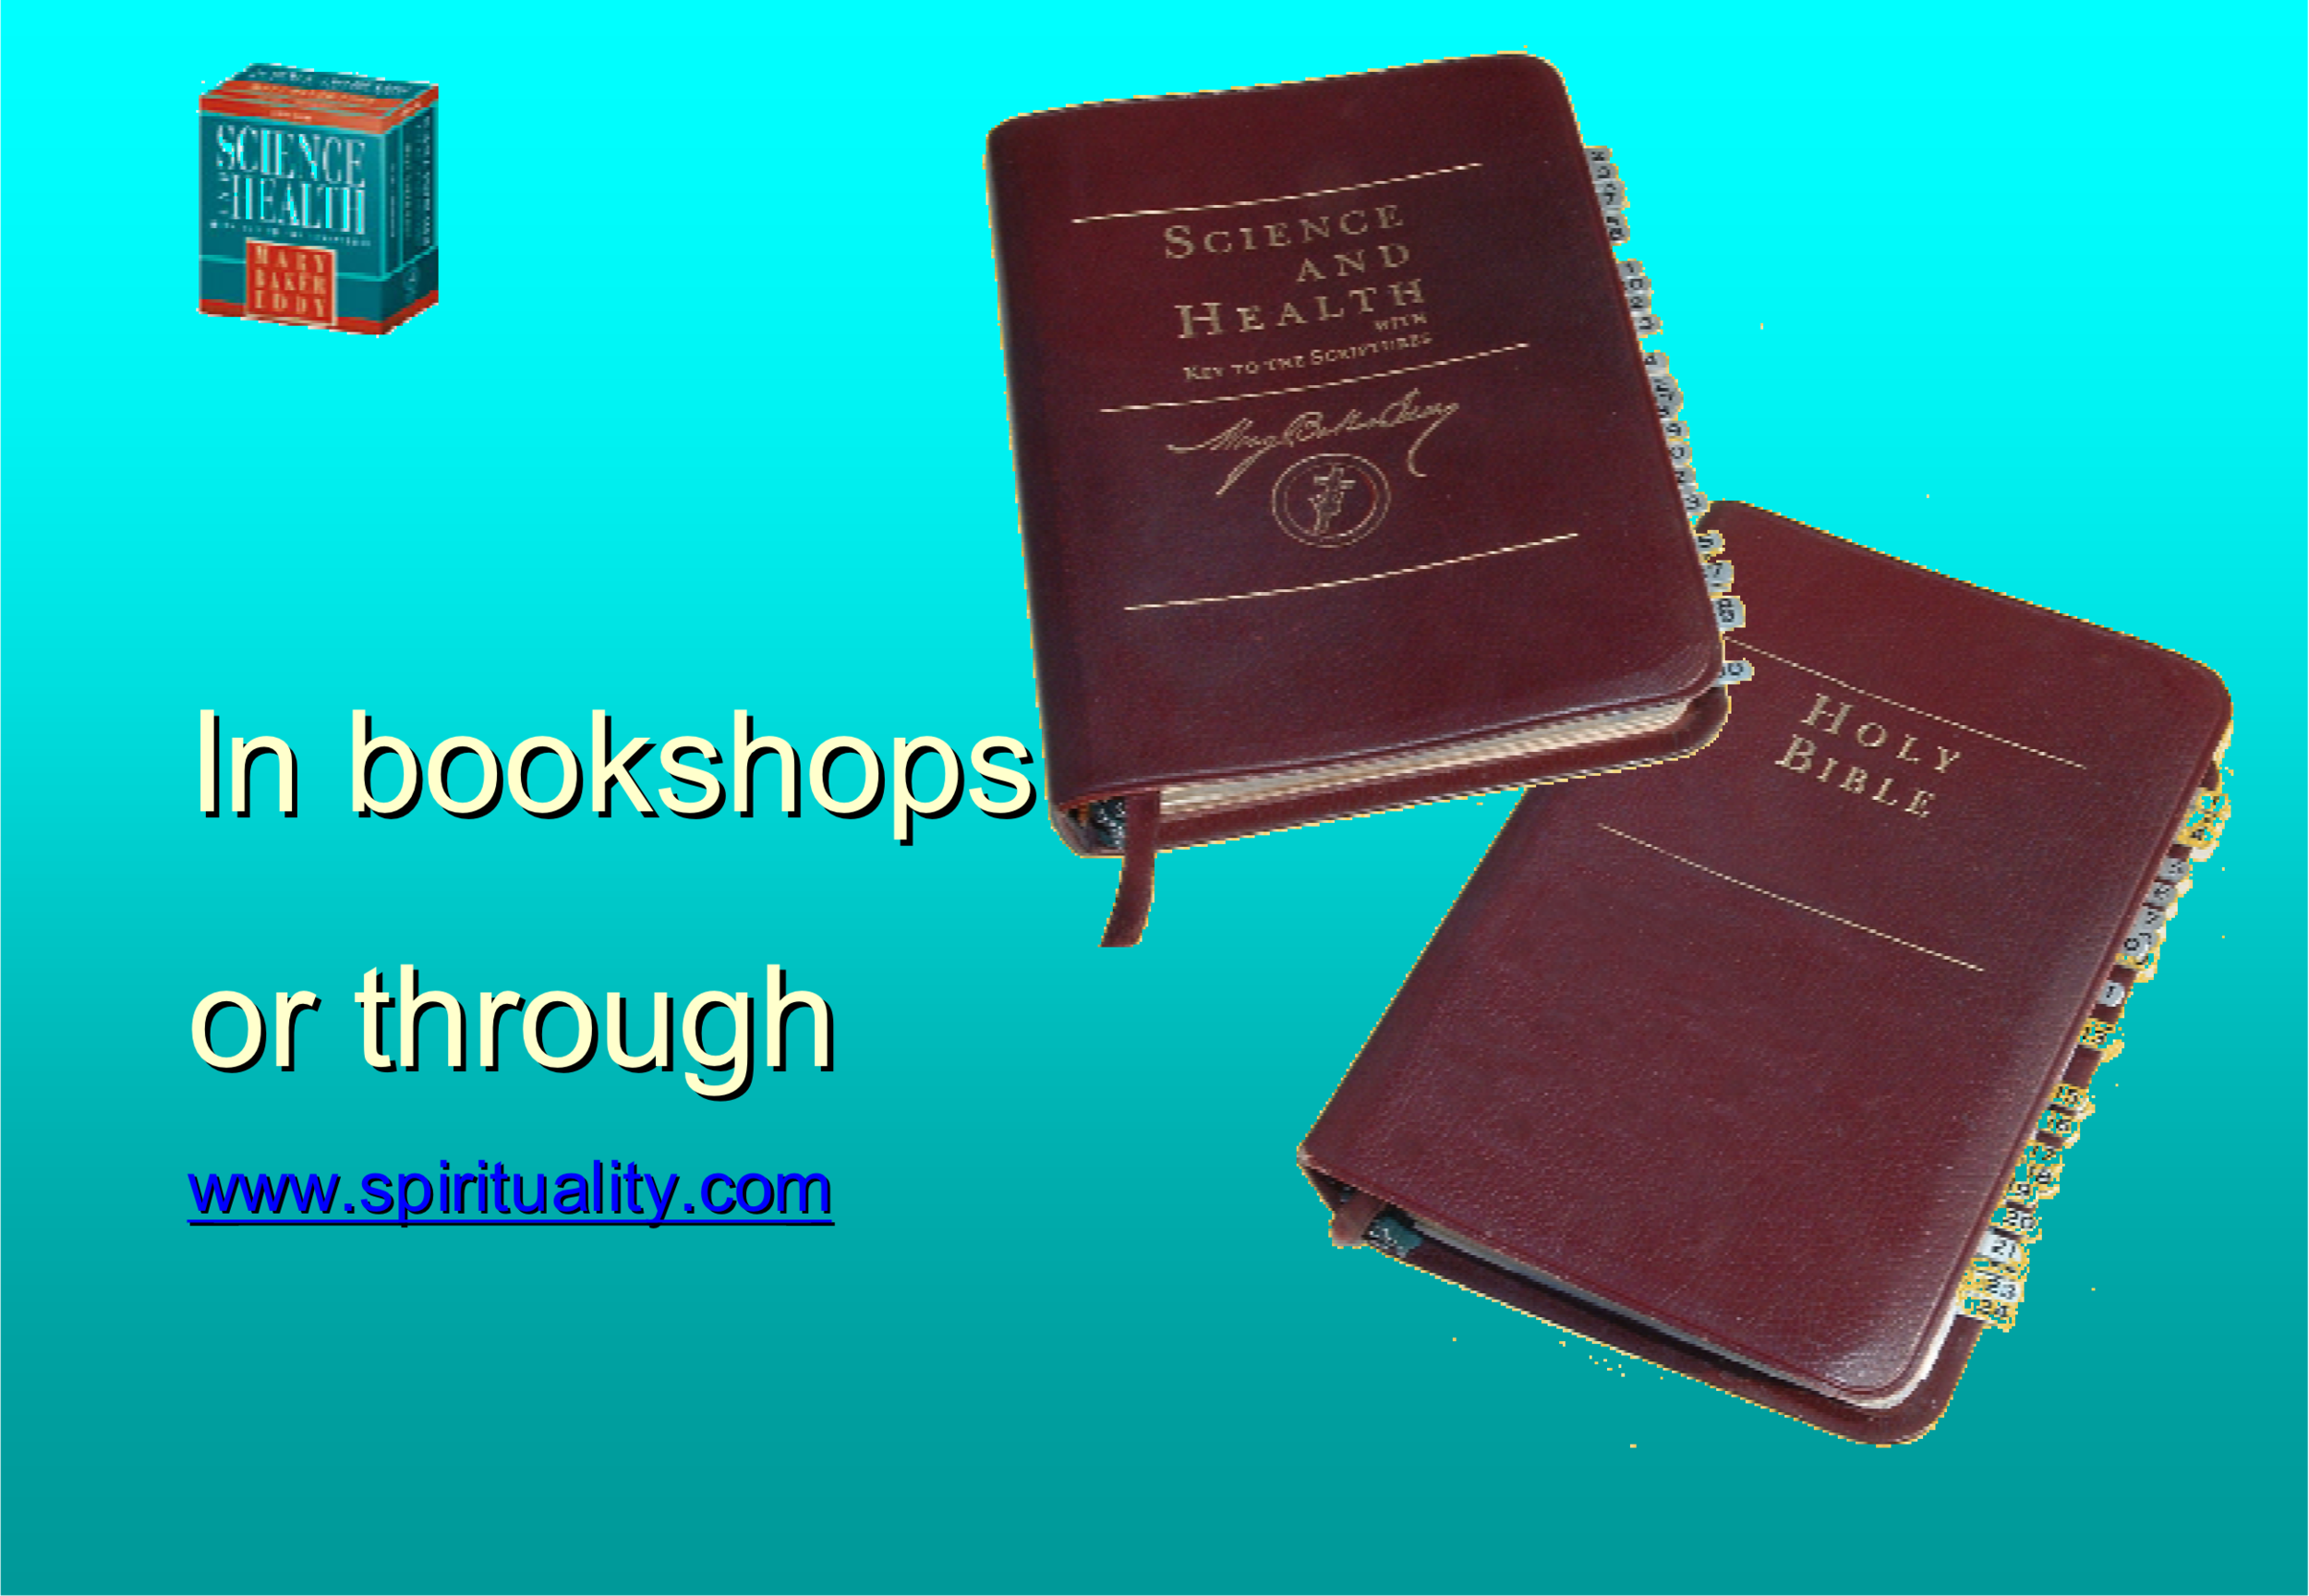 now www.christianscience.com